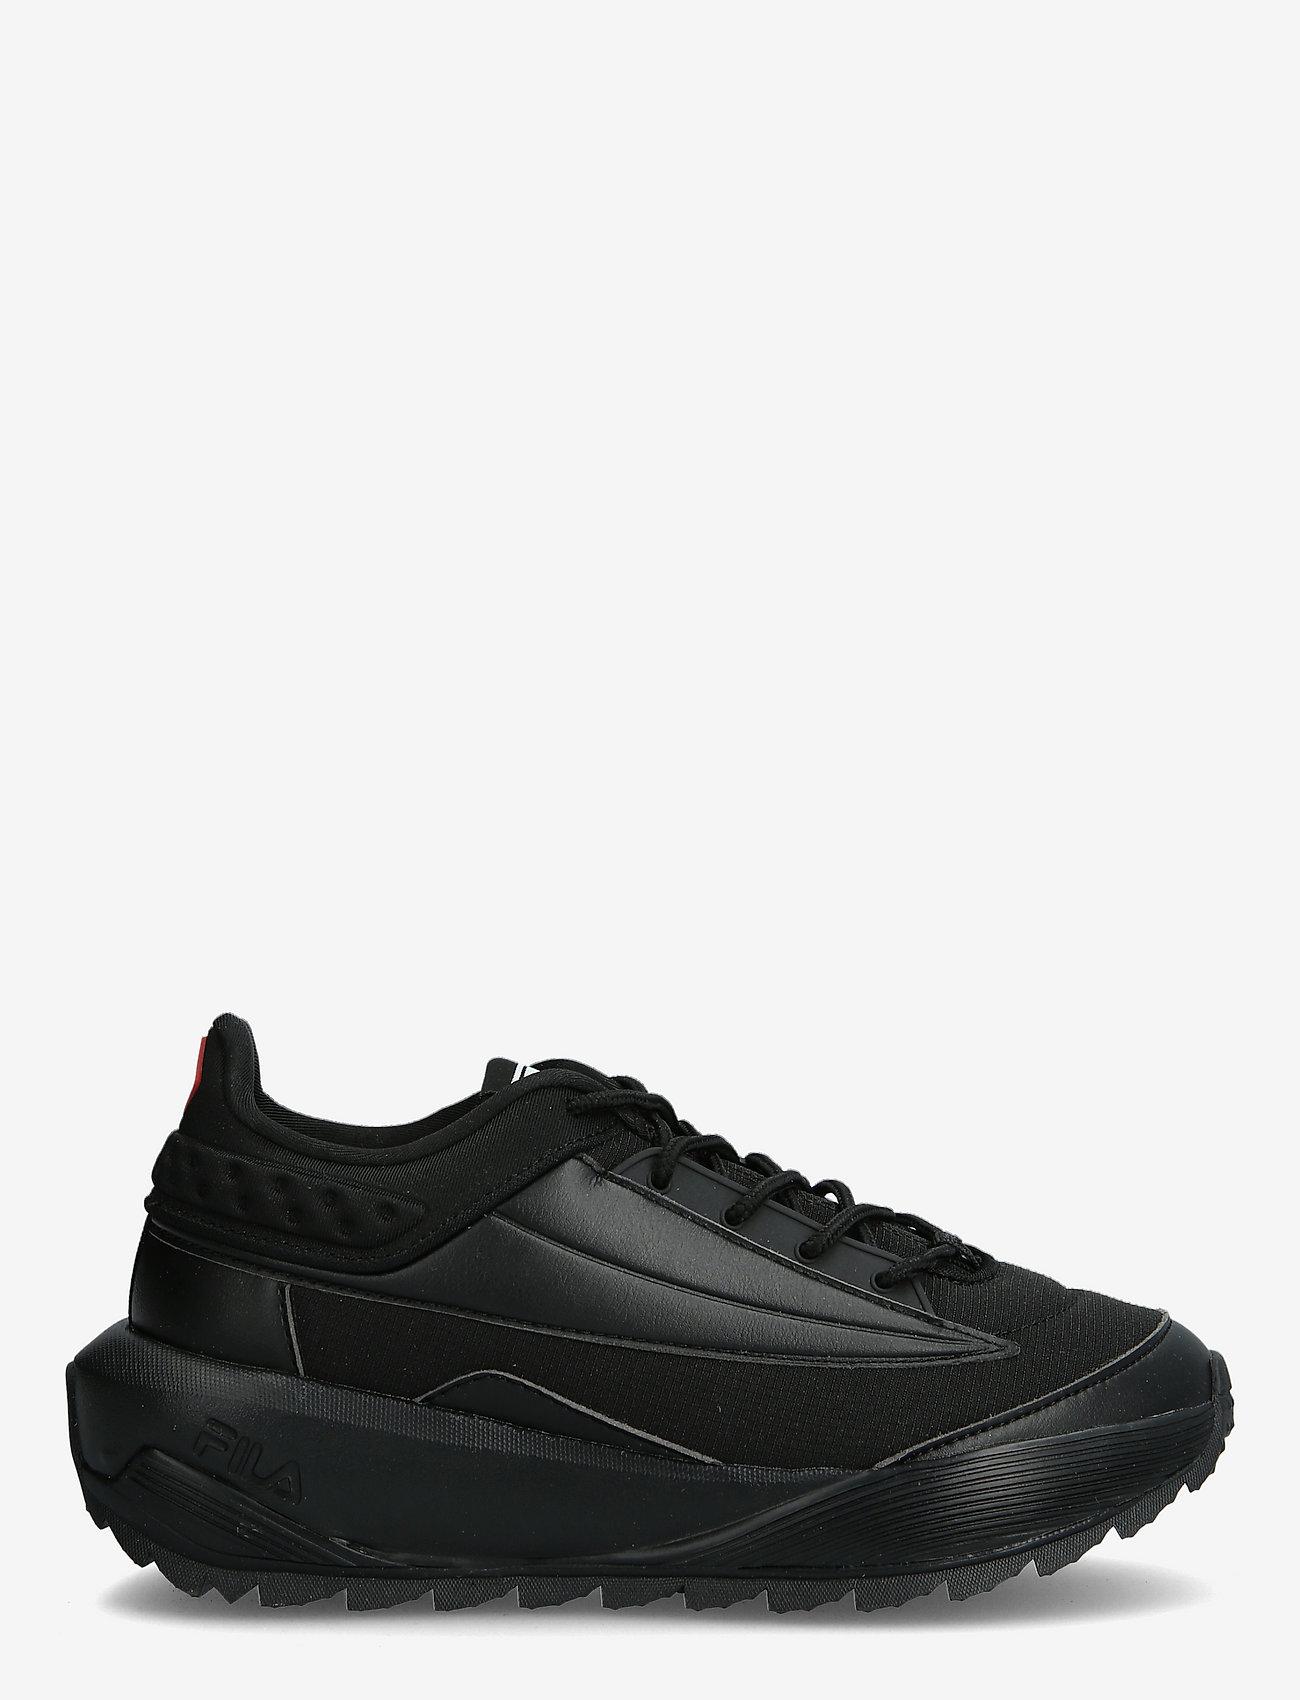 FILA - Throcket wmn - baskets épaisses - black / black - 1